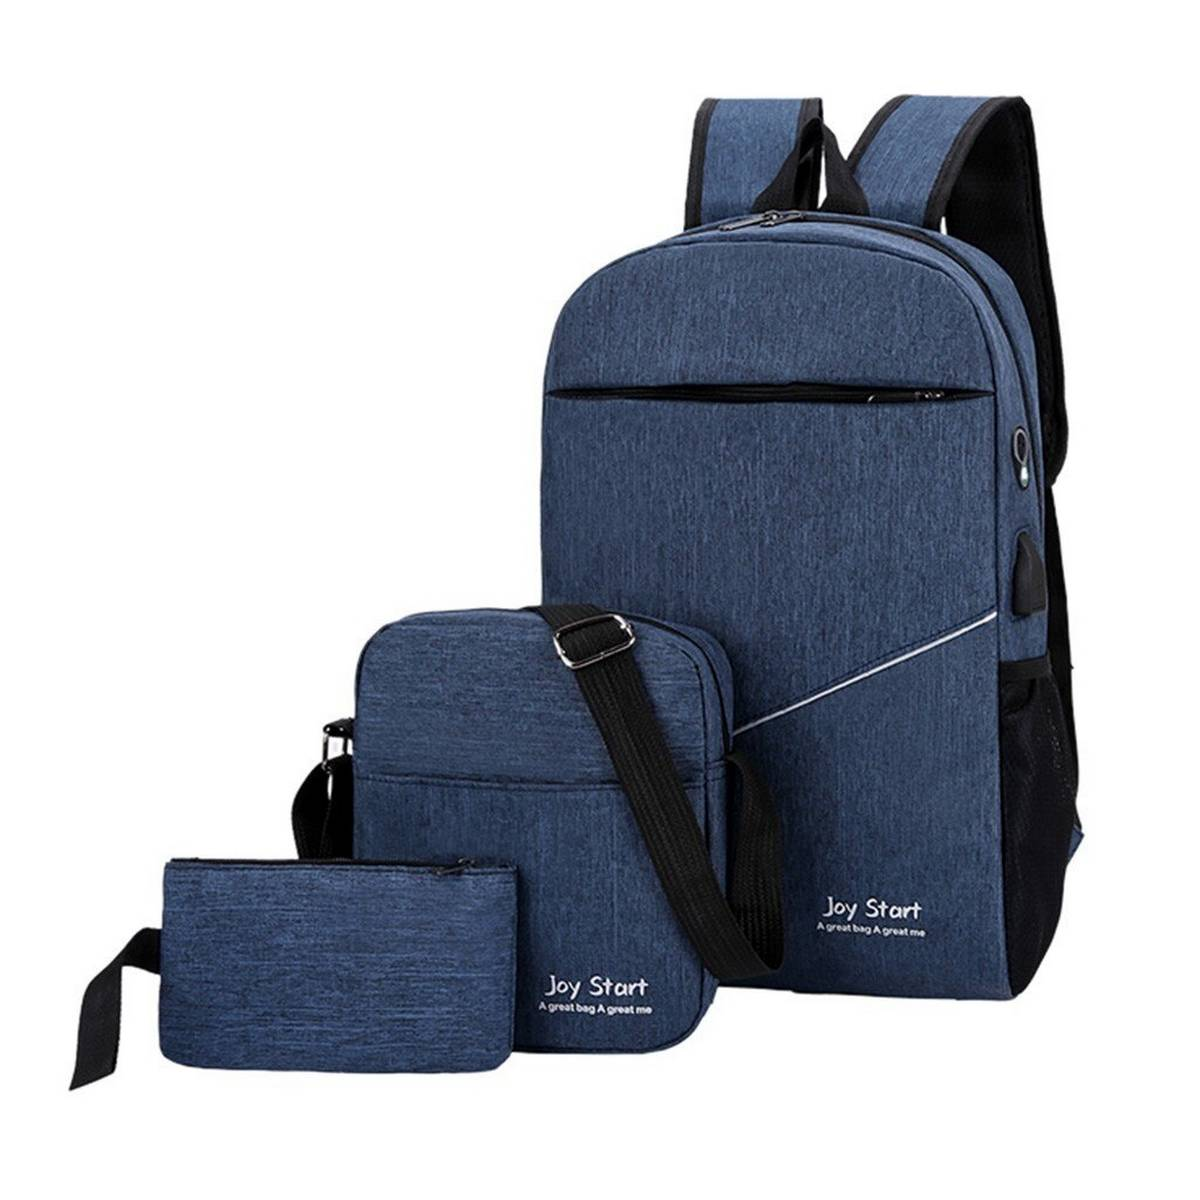 Joy Star 3 in 1 Mens School College University BackPack - High Quality Classic 3 Pcs Bagpack Laptop Bag for Girls/Boys